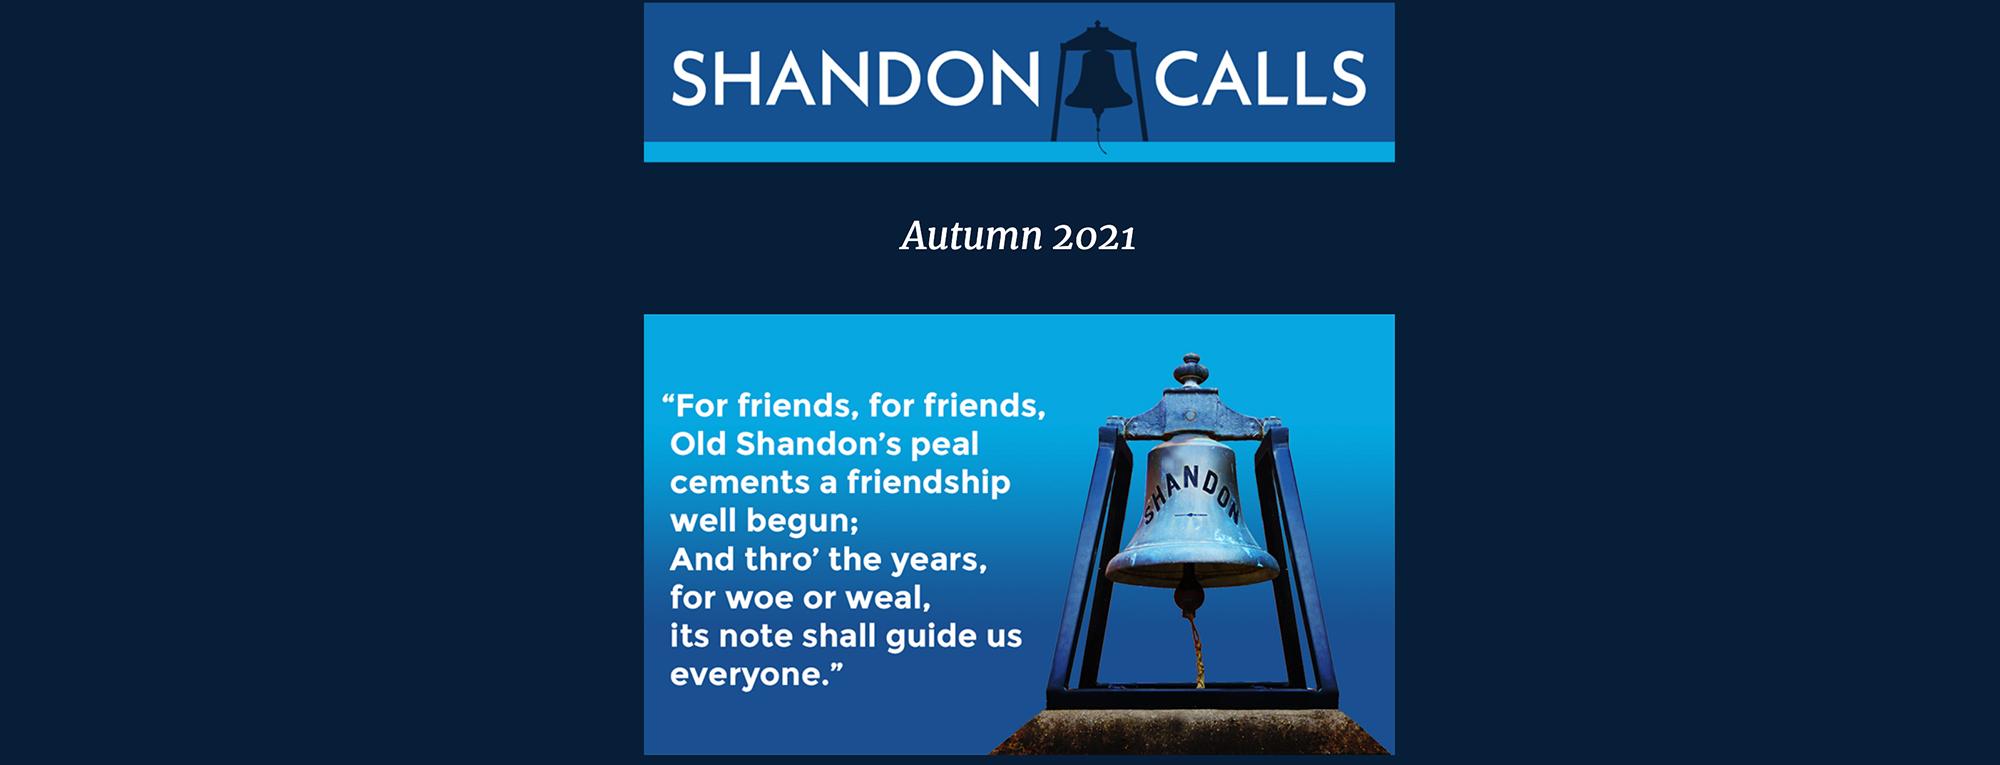 Shandon Calls Autumn